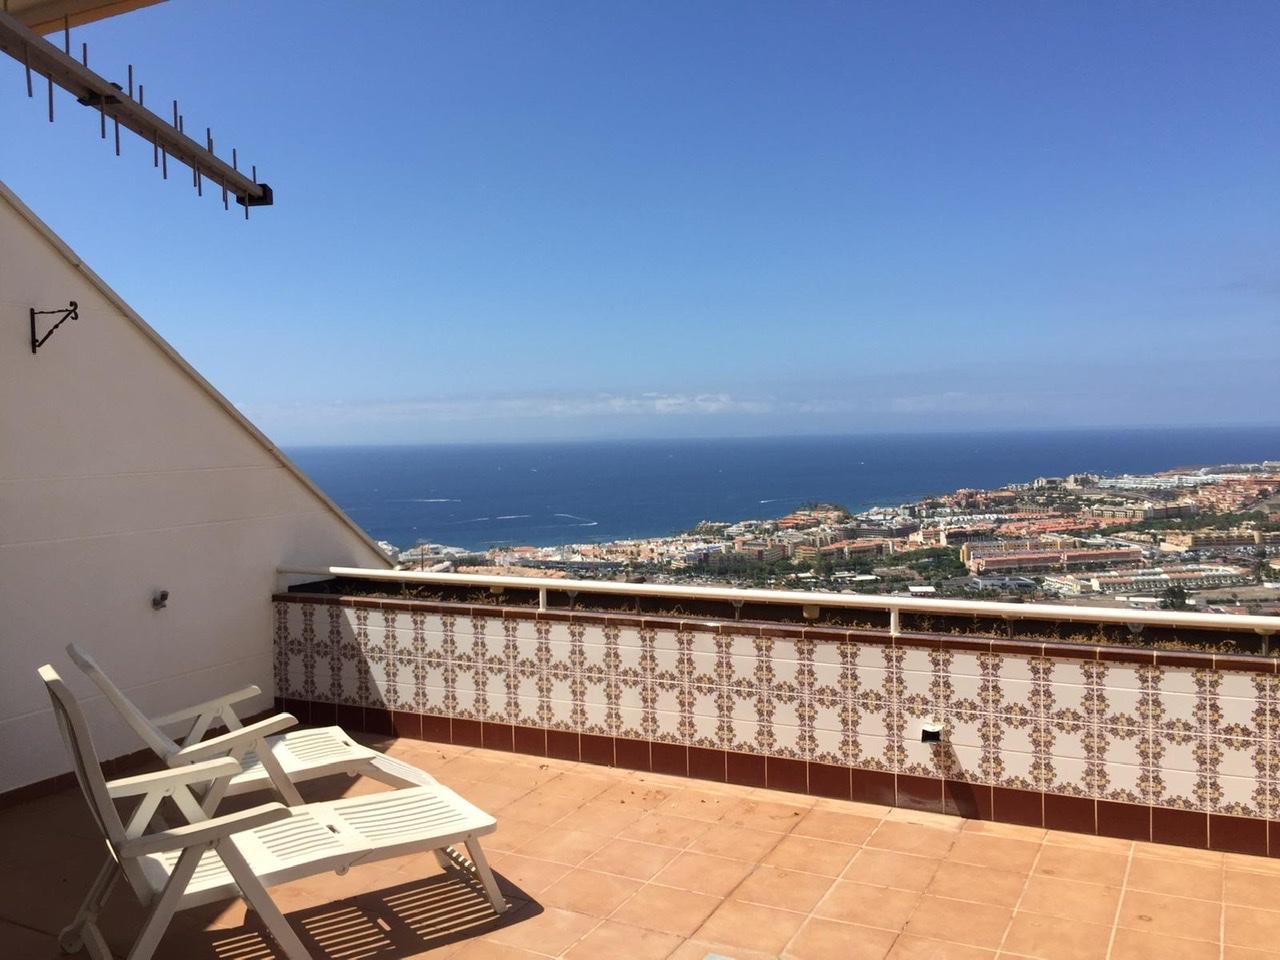 Letting Property Home T019070S, Tenerife, South Tenerife, Torviscas Alto